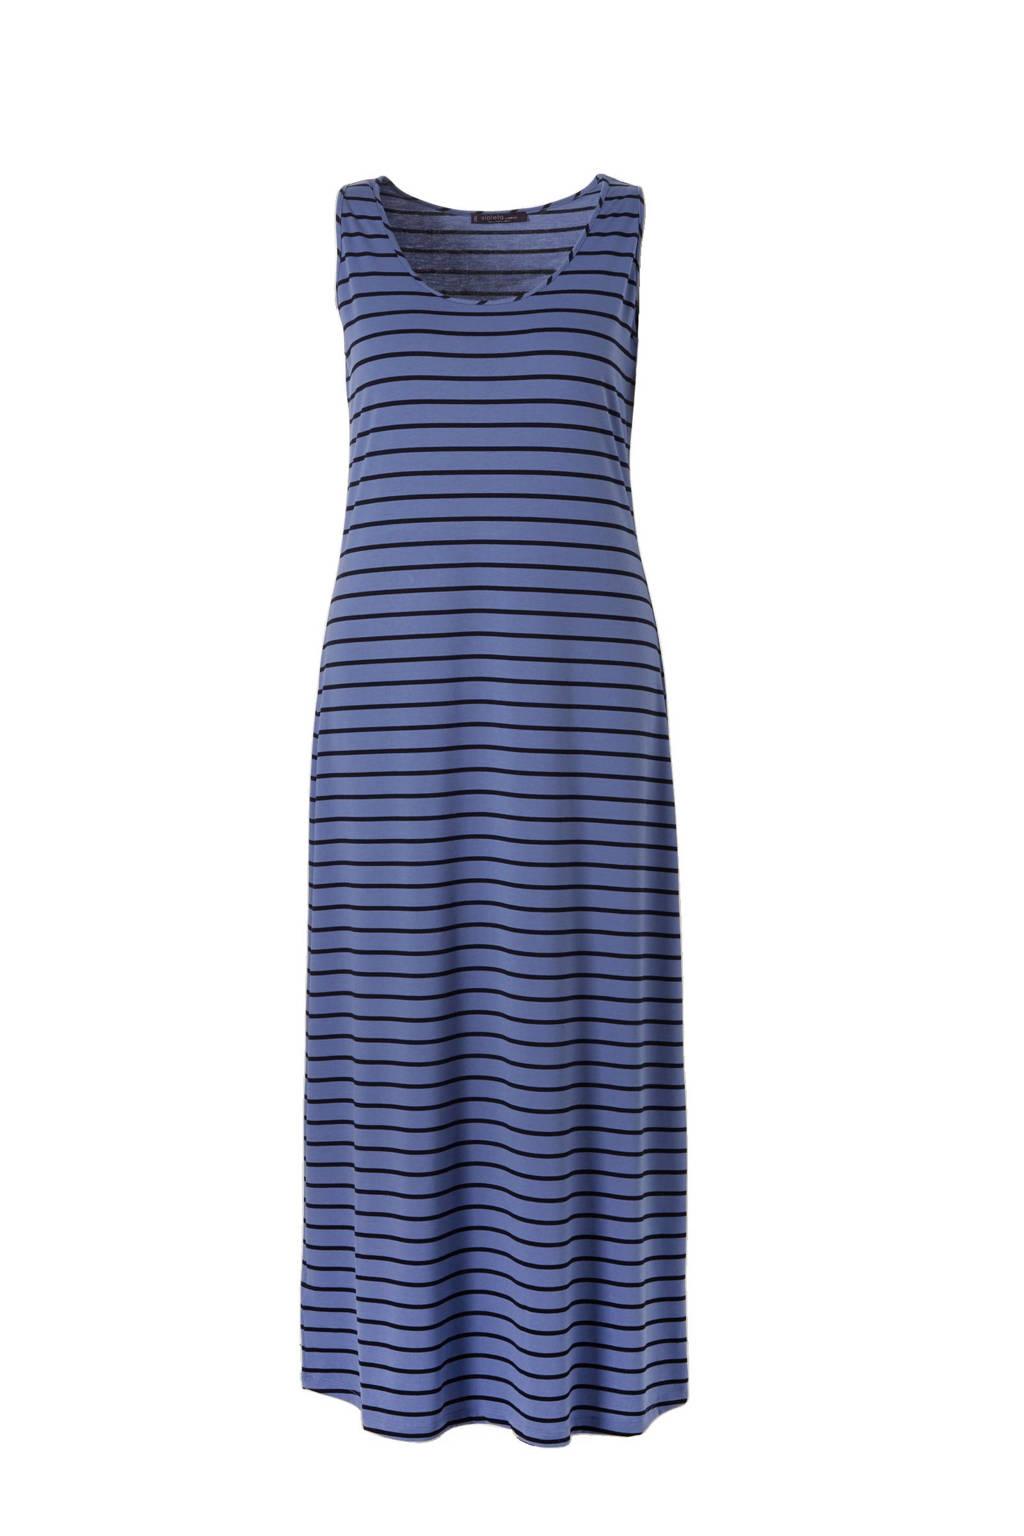 Violeta by Mango maxi jurk, middenblauw